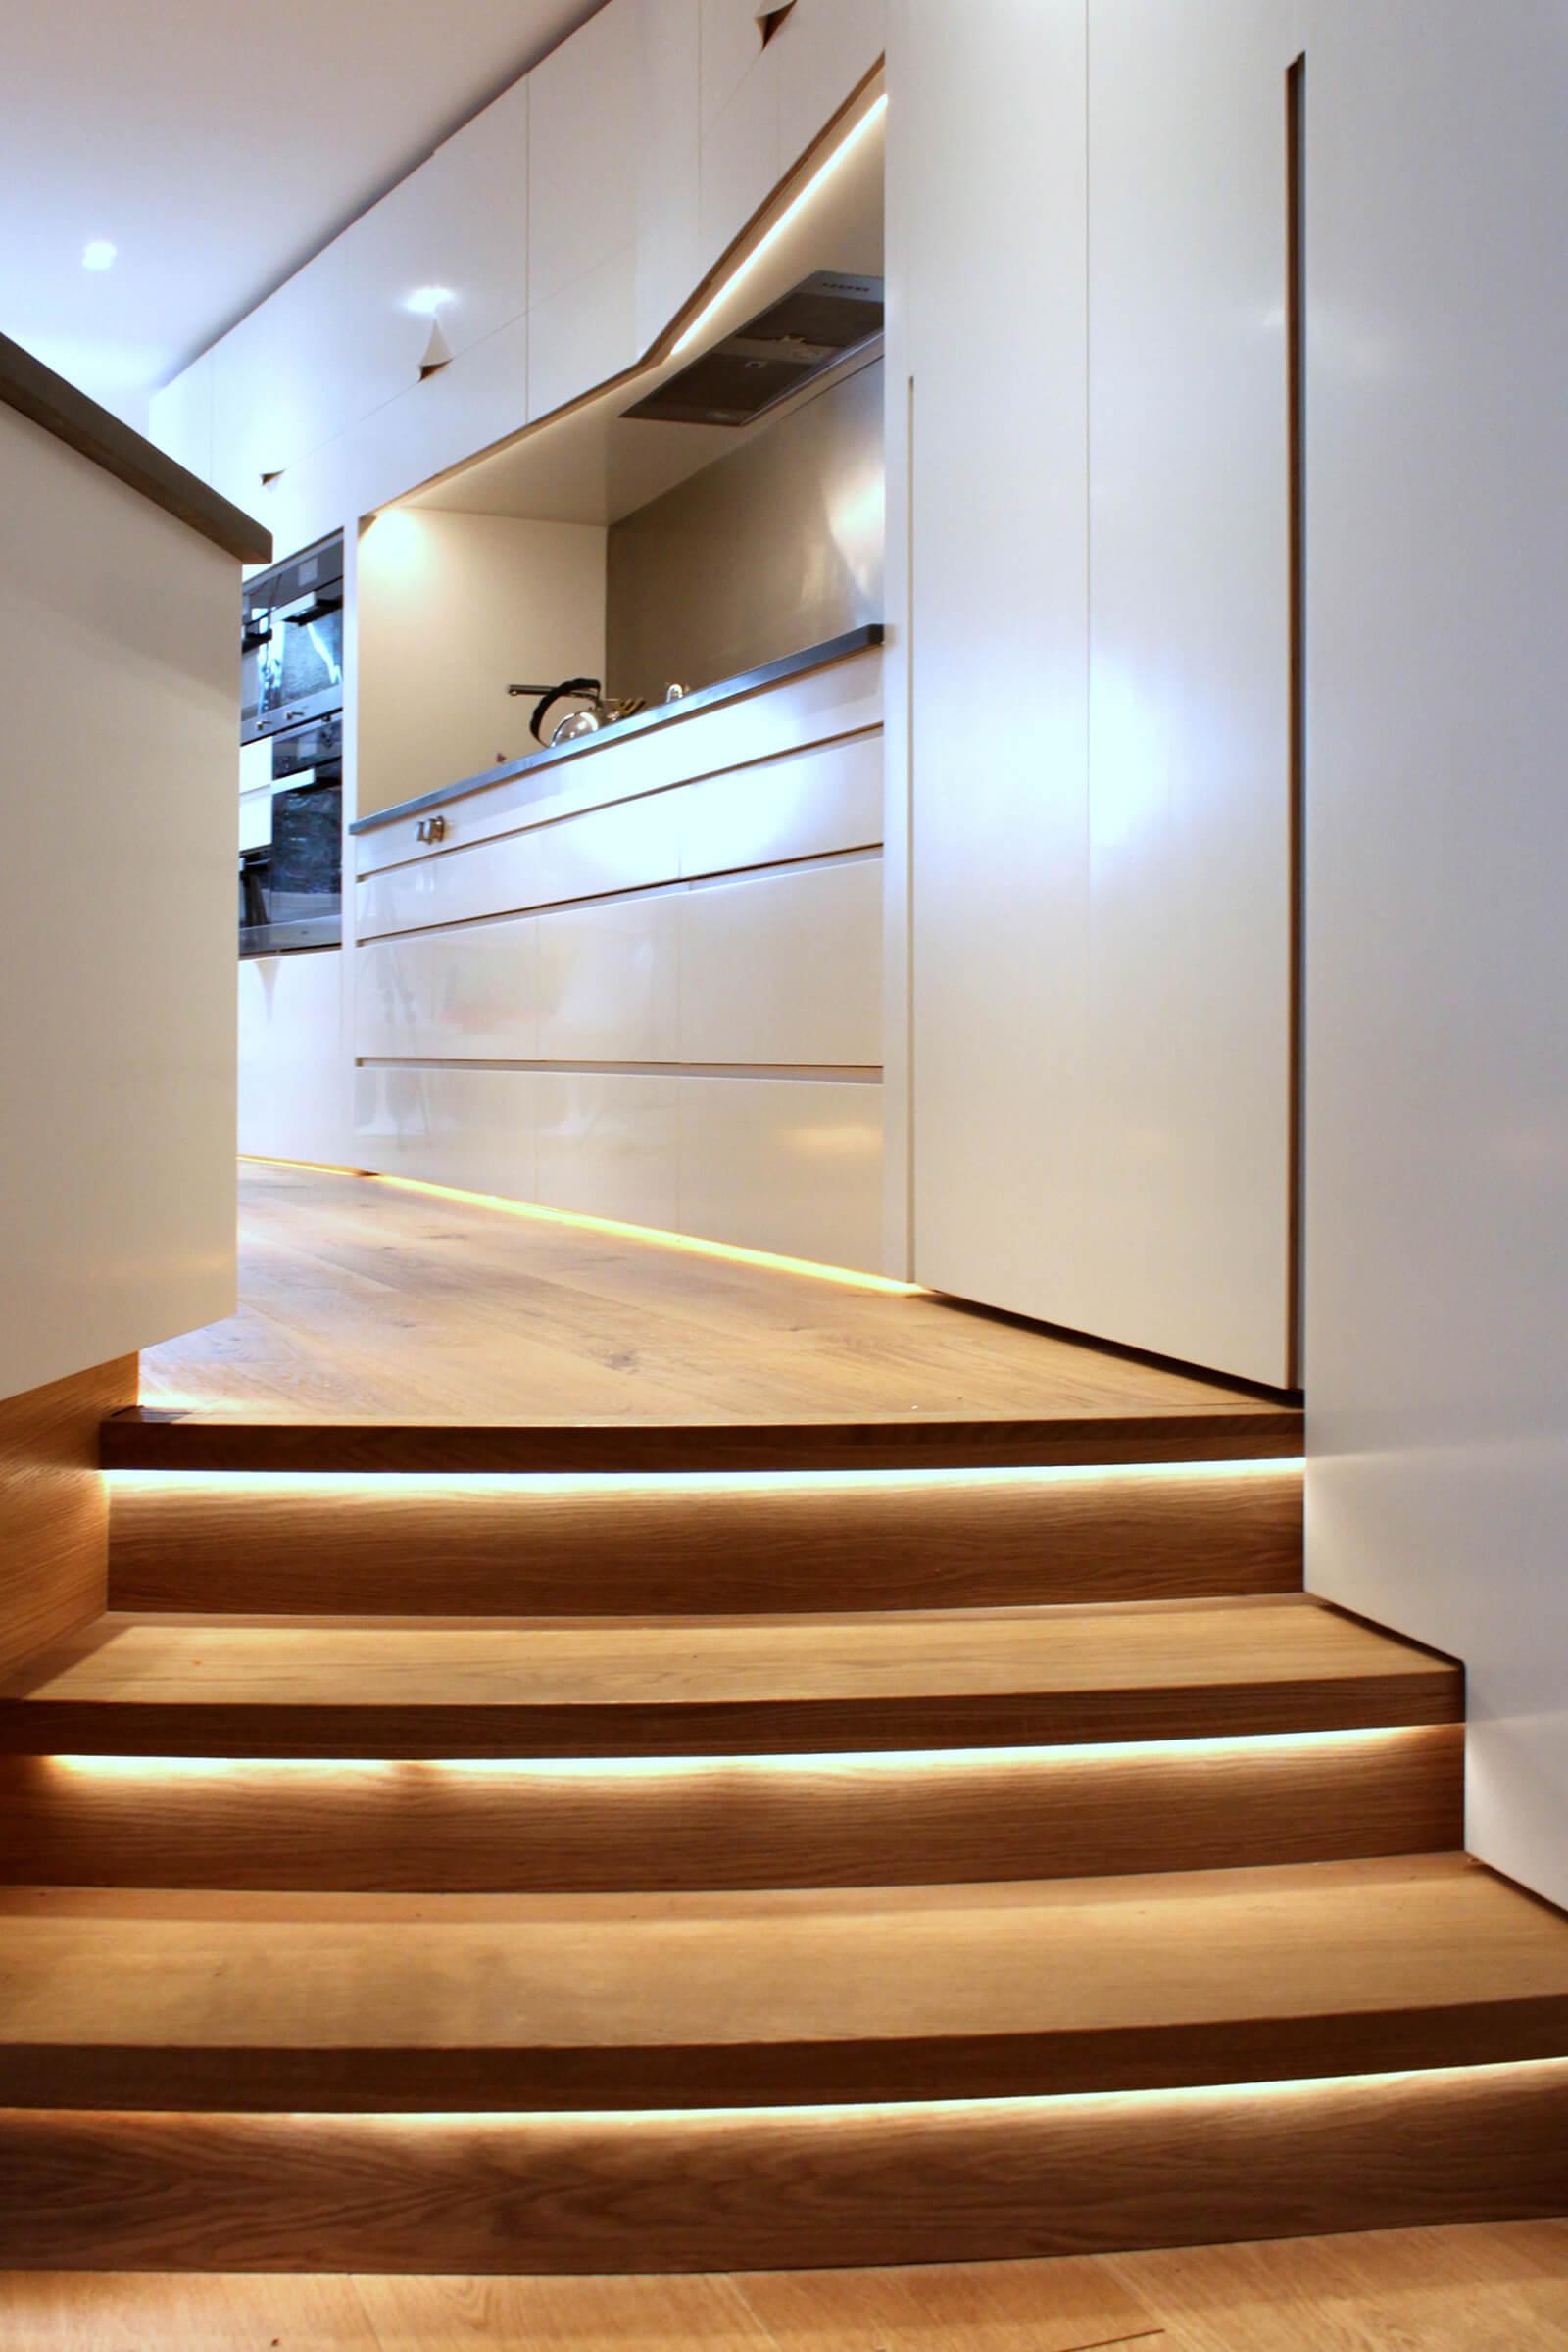 hidden led lighting on steps in white and oak kitchen designed by Splinterworks